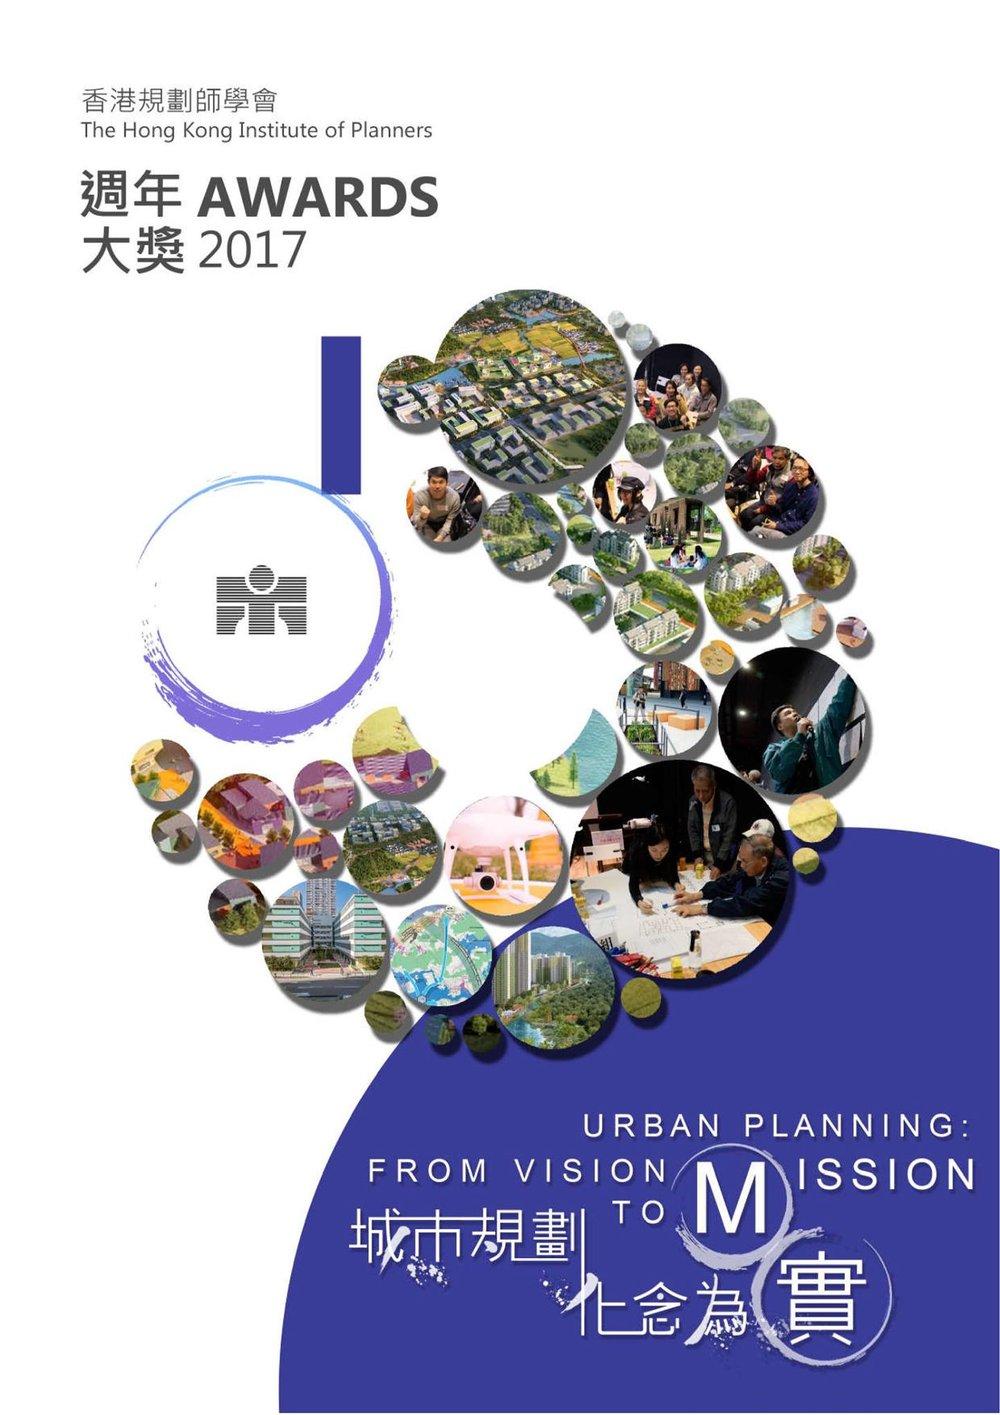 HKIP Awards 2017-Pamphlet-1.jpg